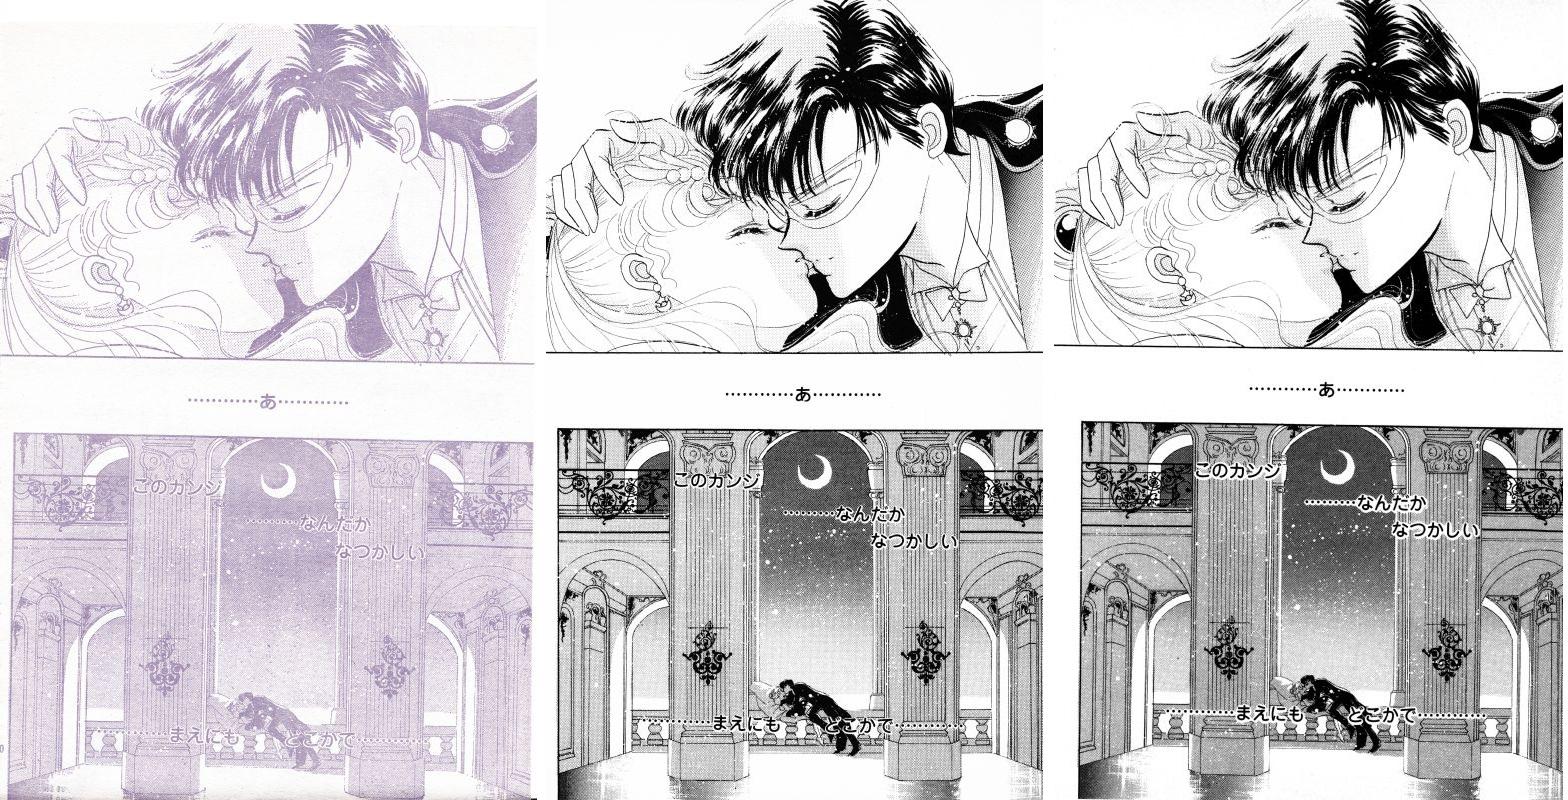 Act 4, Page 37 – Nakayoshi, Original, Remaster